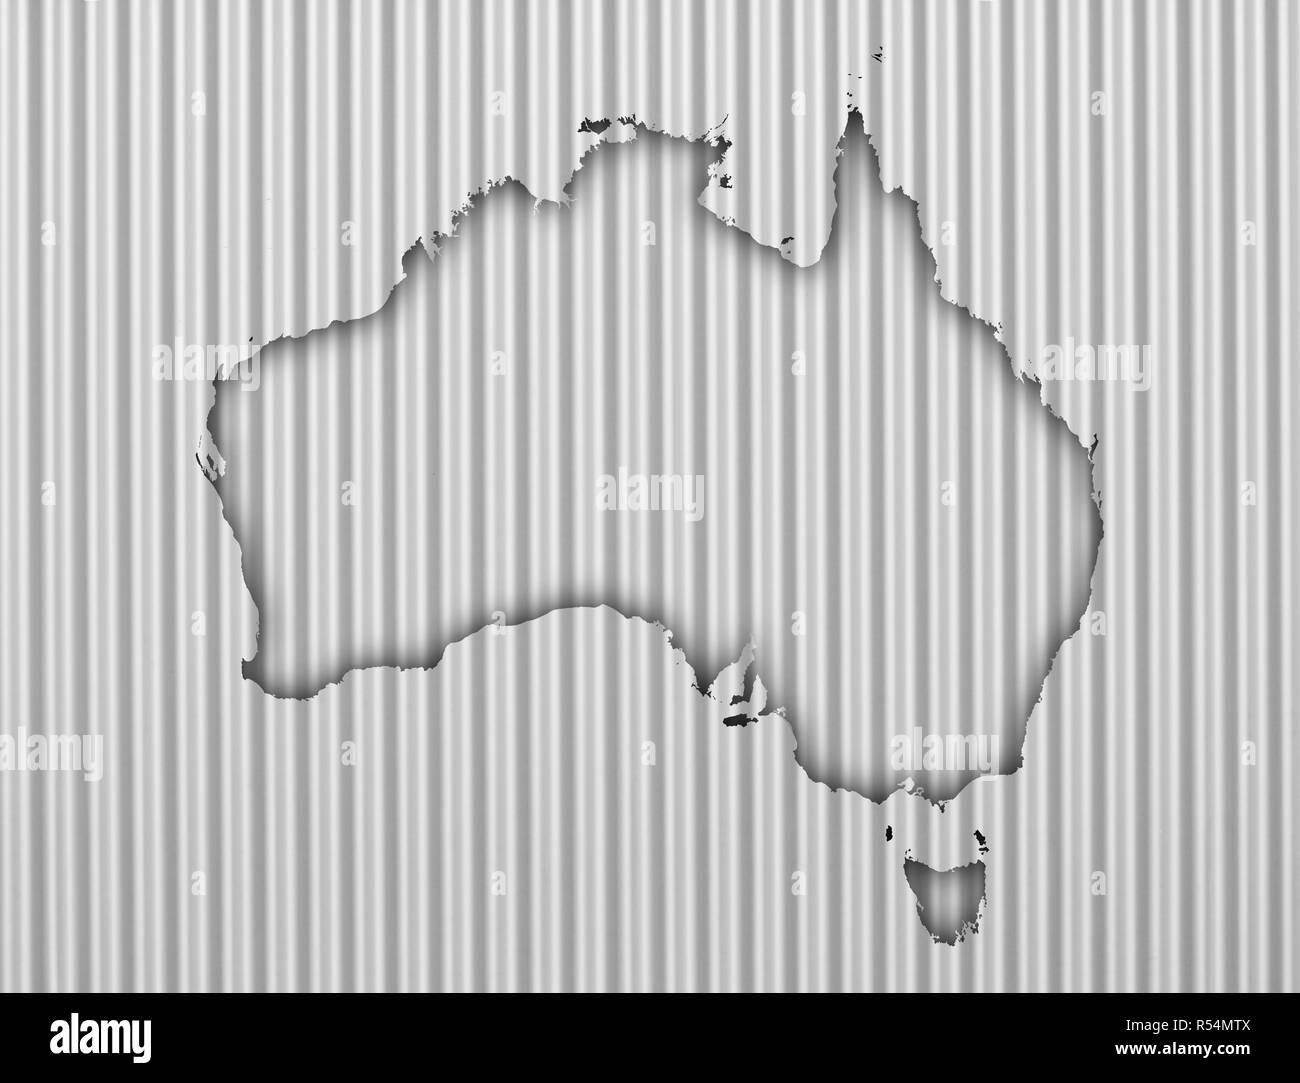 Australia Map In R.Map Of Australia On Texture R Stock Photo 226912250 Alamy